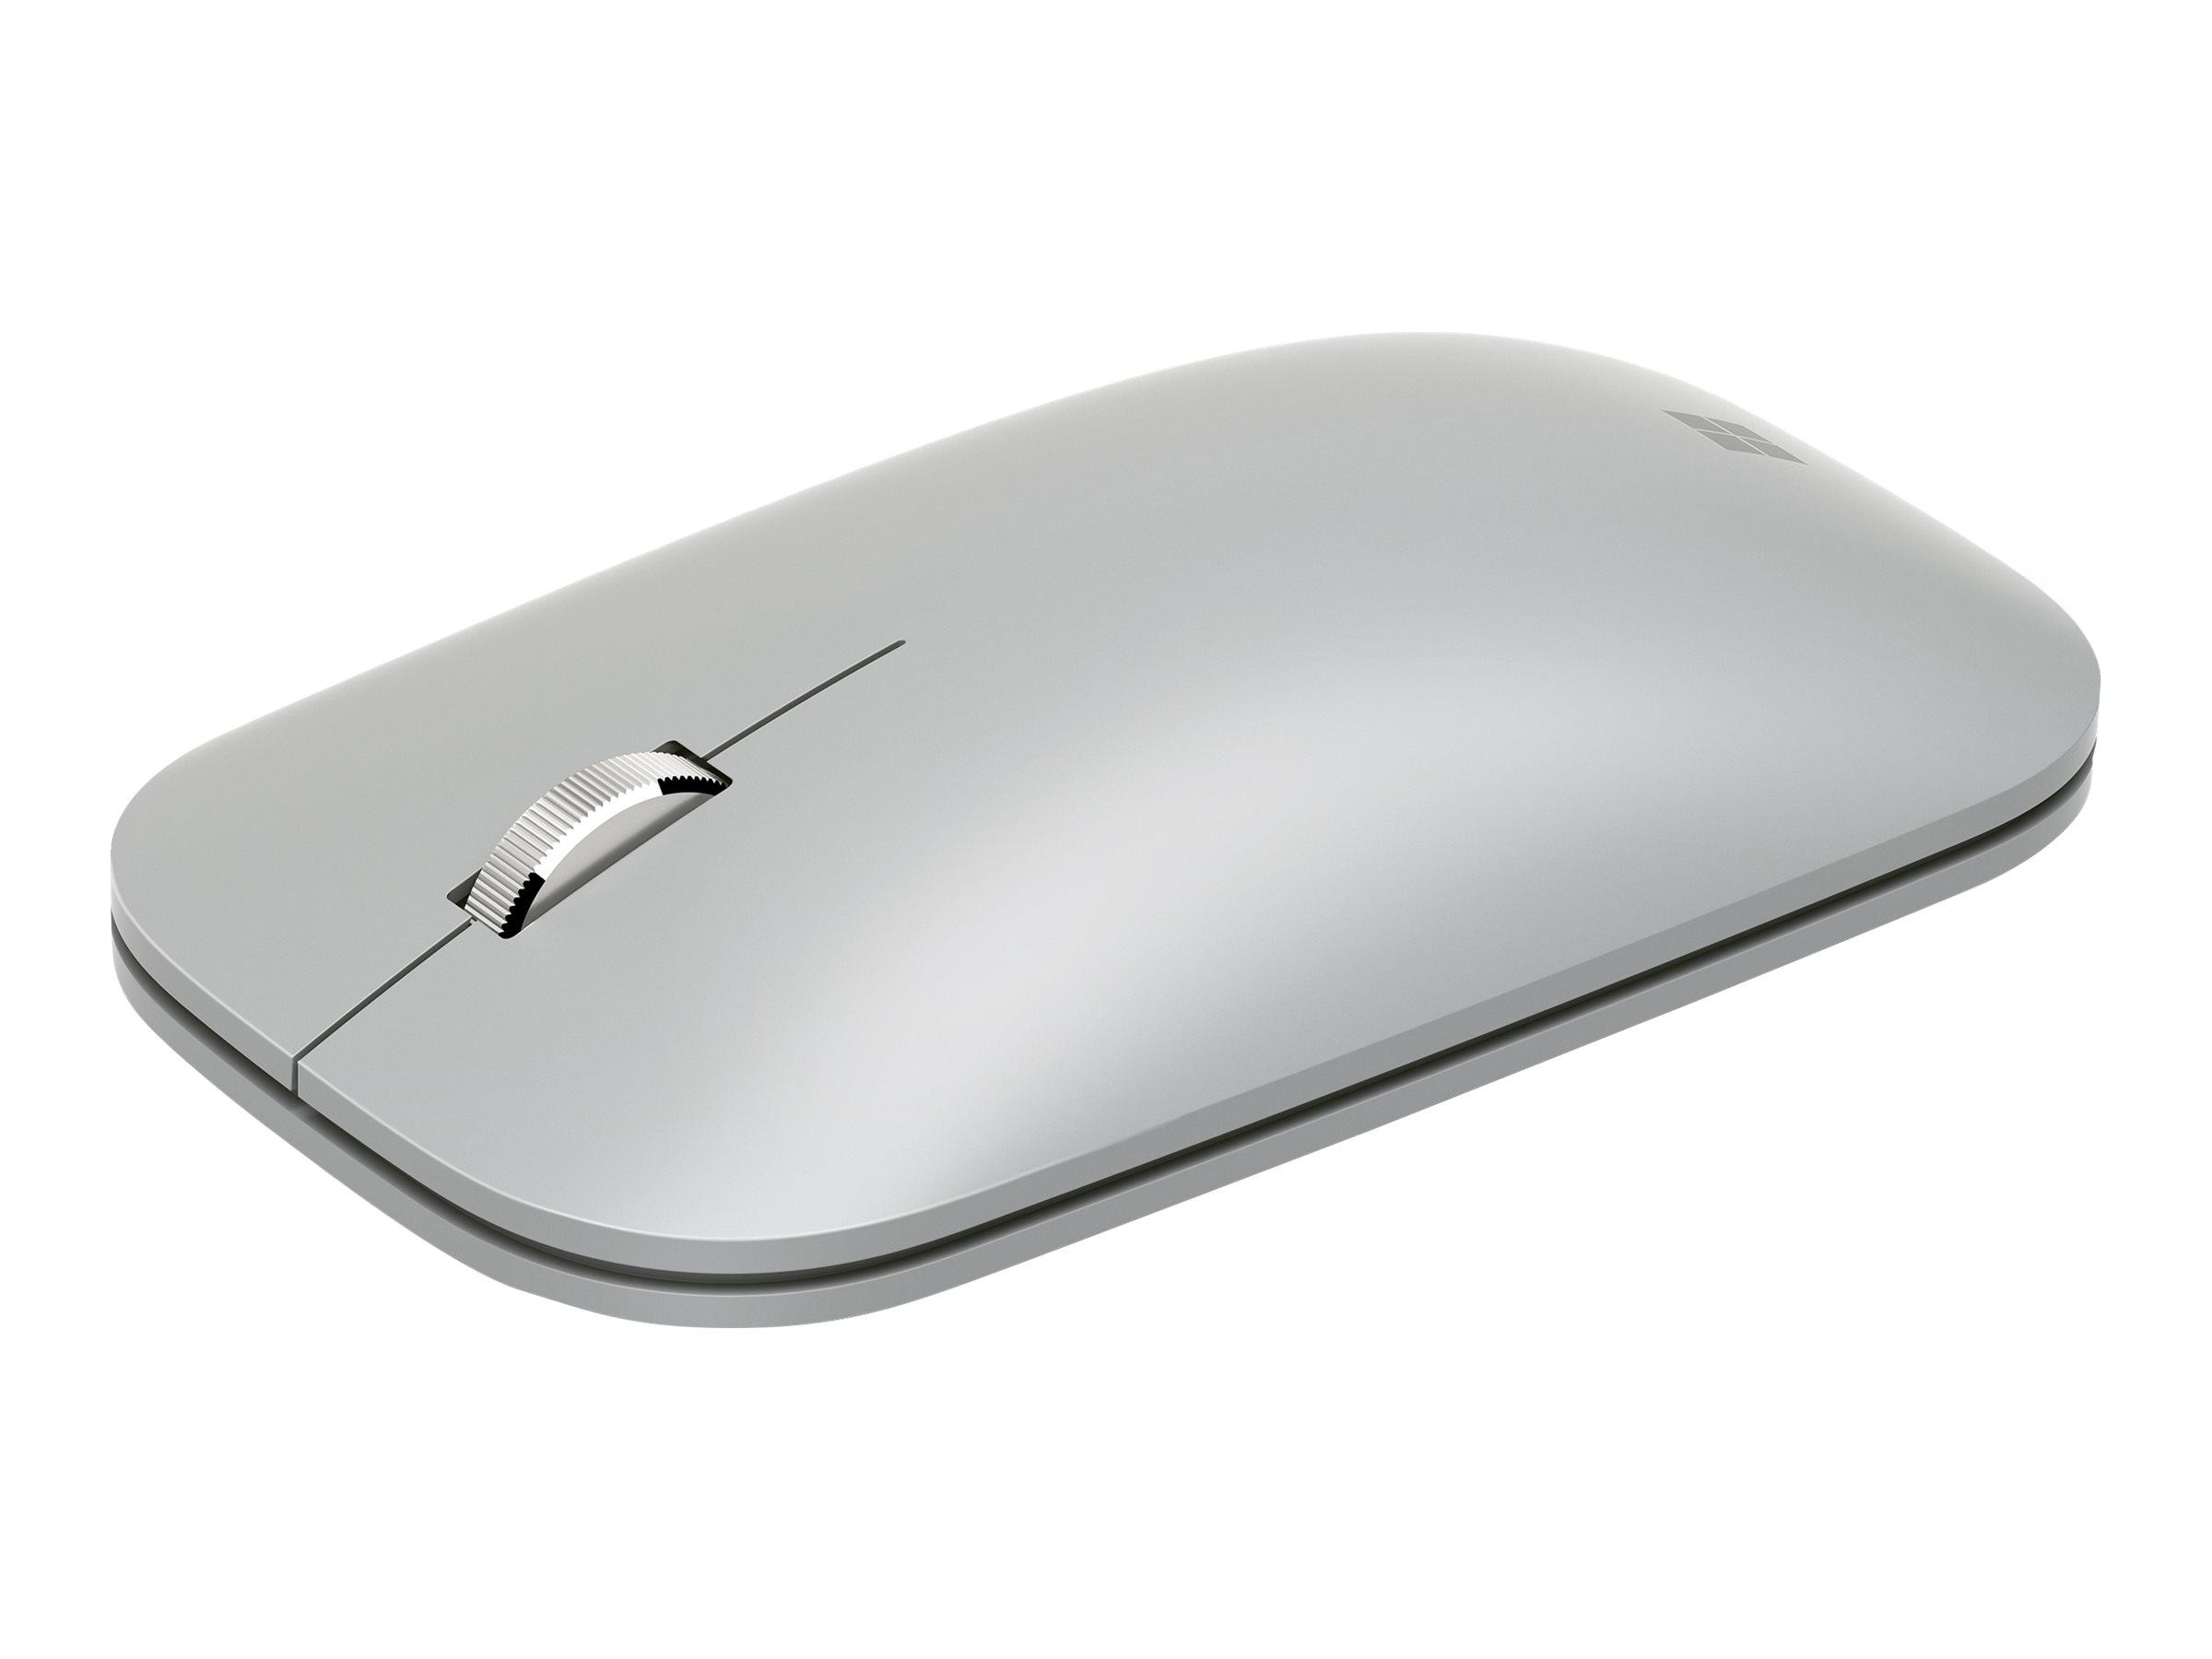 Surface mobile mouse maus optisch 3 tasten kabellos bluetooth 4 2 9323480 kgz 00032